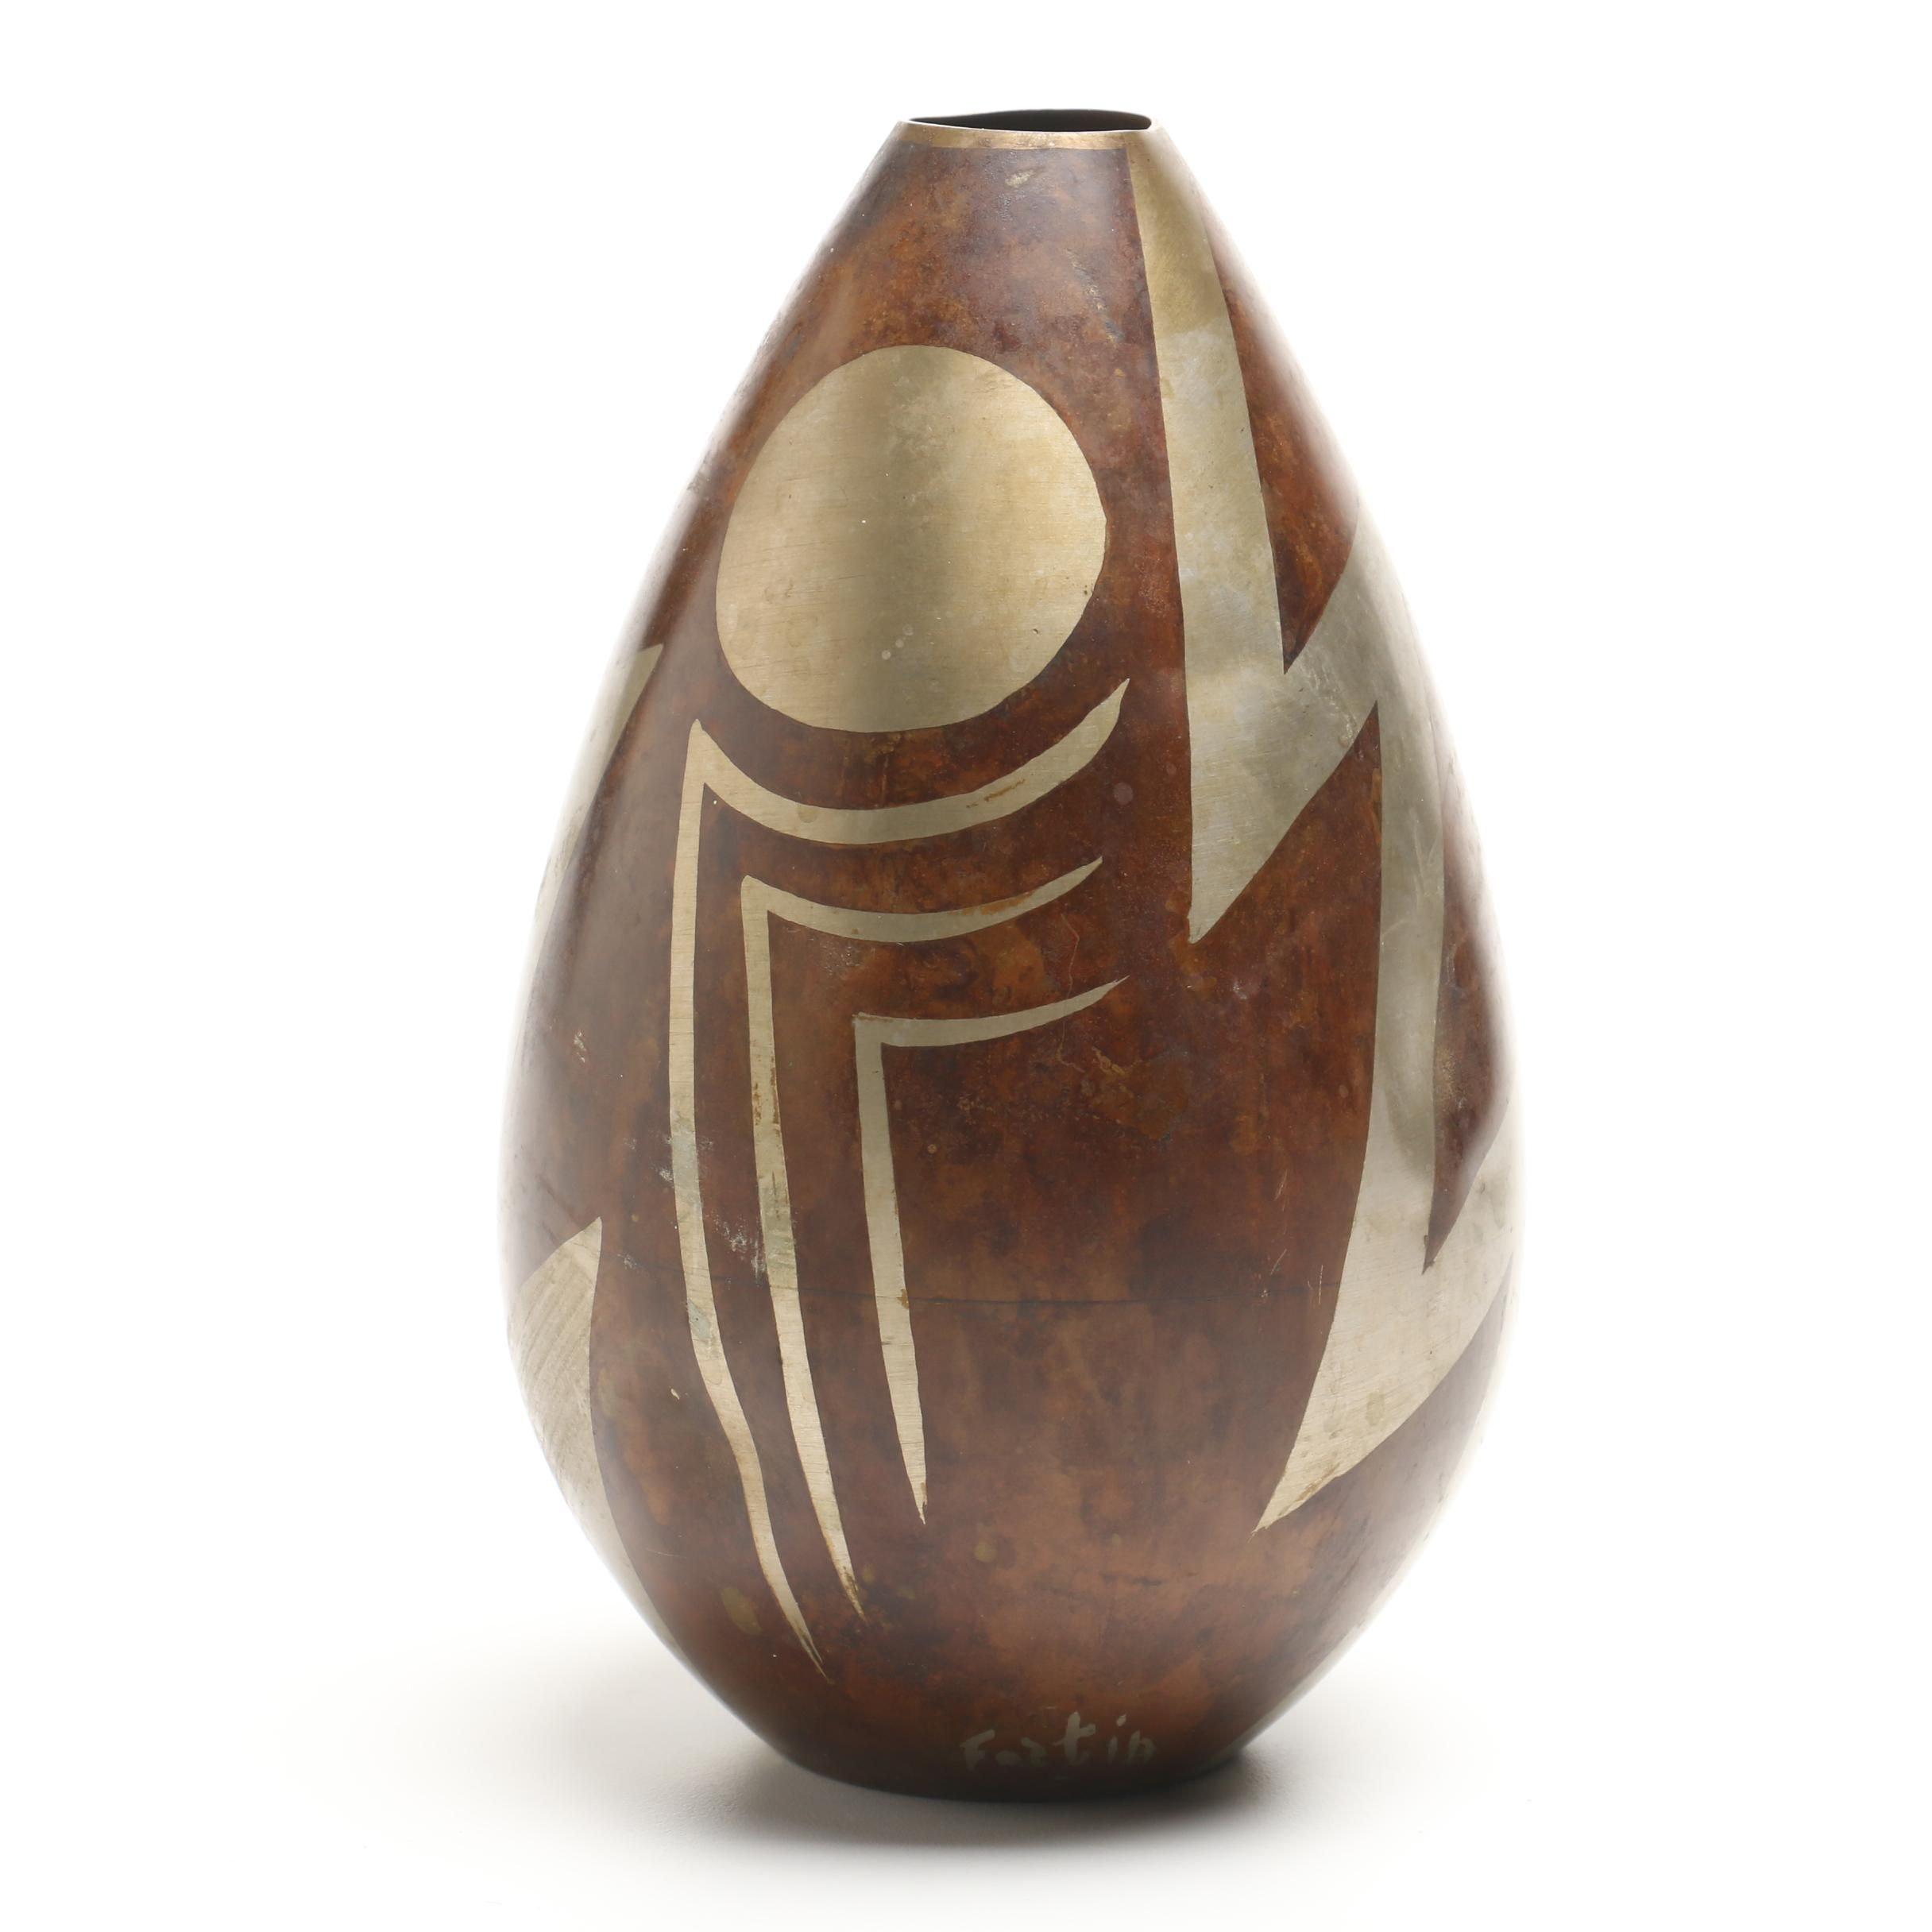 Vintage Art Deco Style Mixed Metal Vase